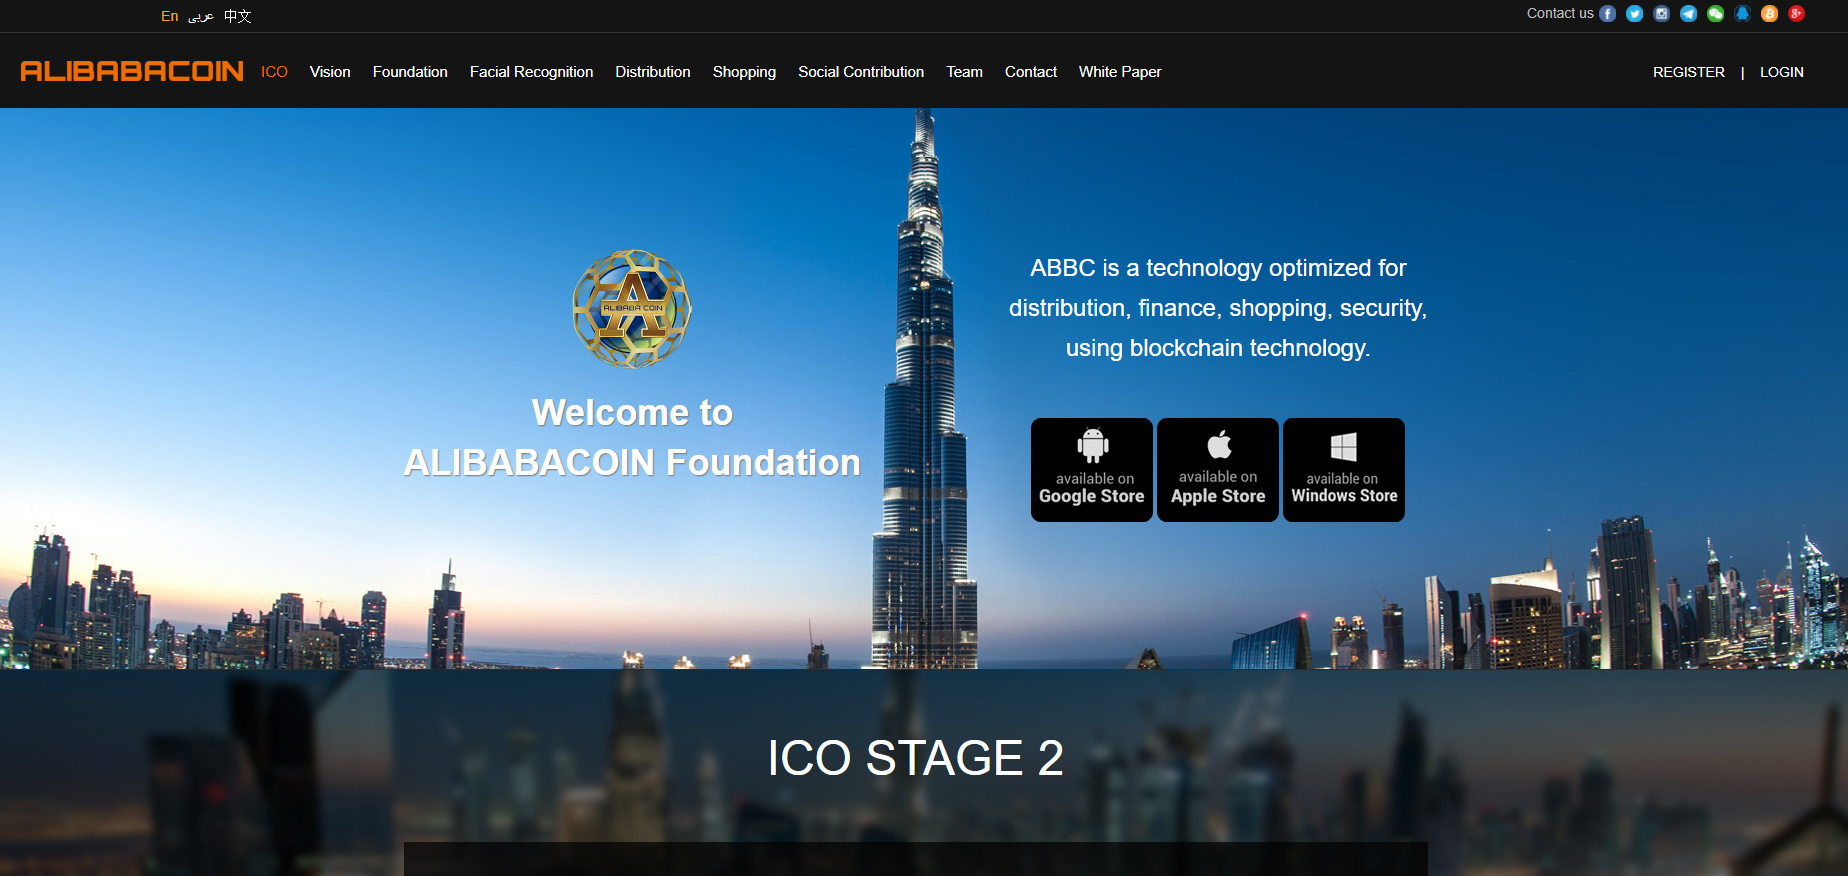 Alibabacoin Foundation.